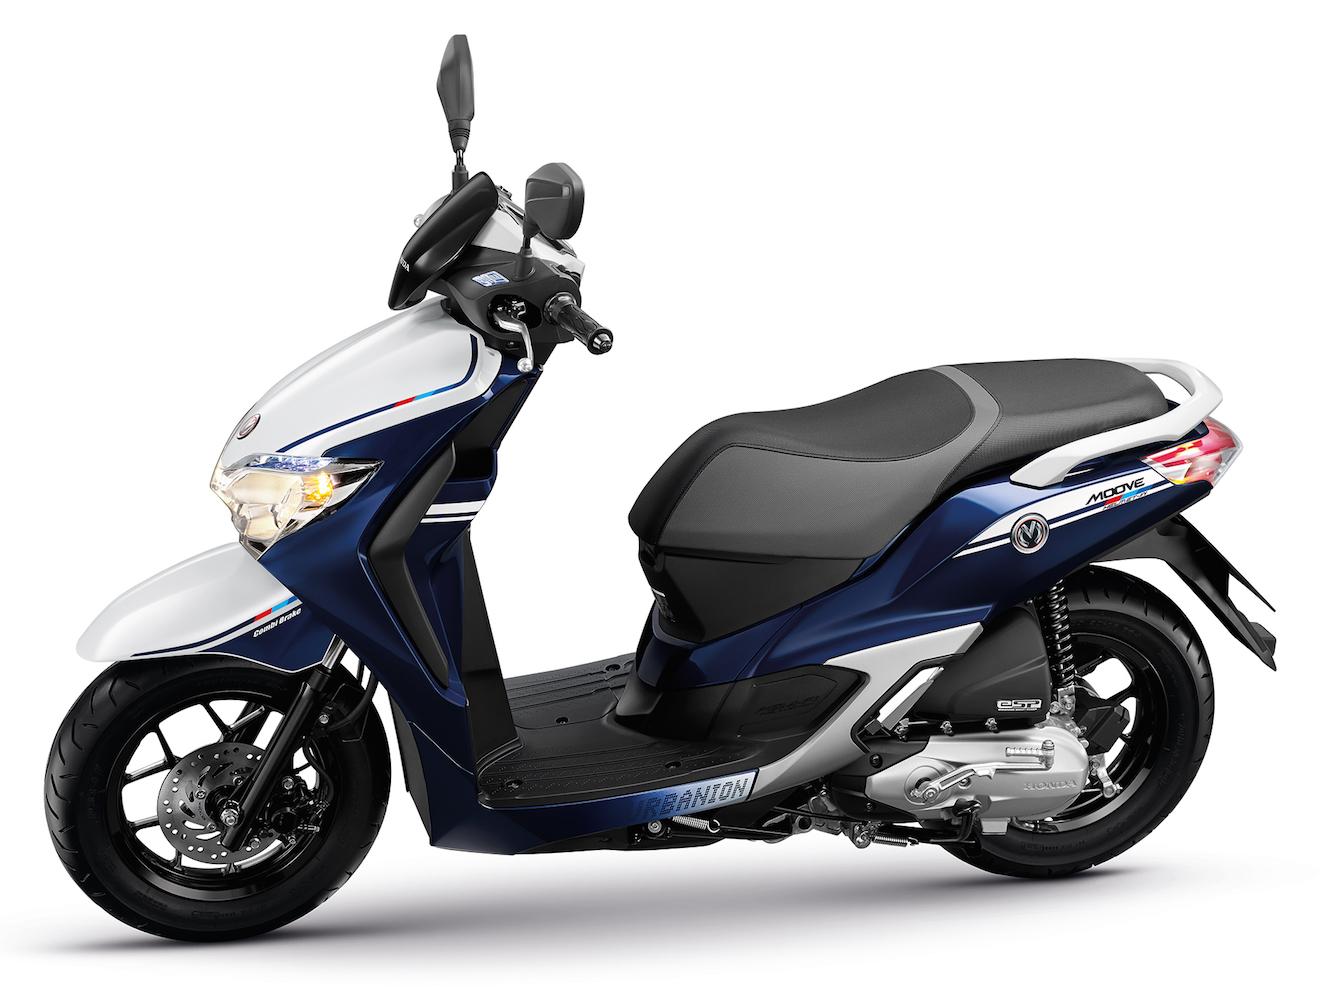 Ap Honda Launches Honda Moove Thailand S First Smart